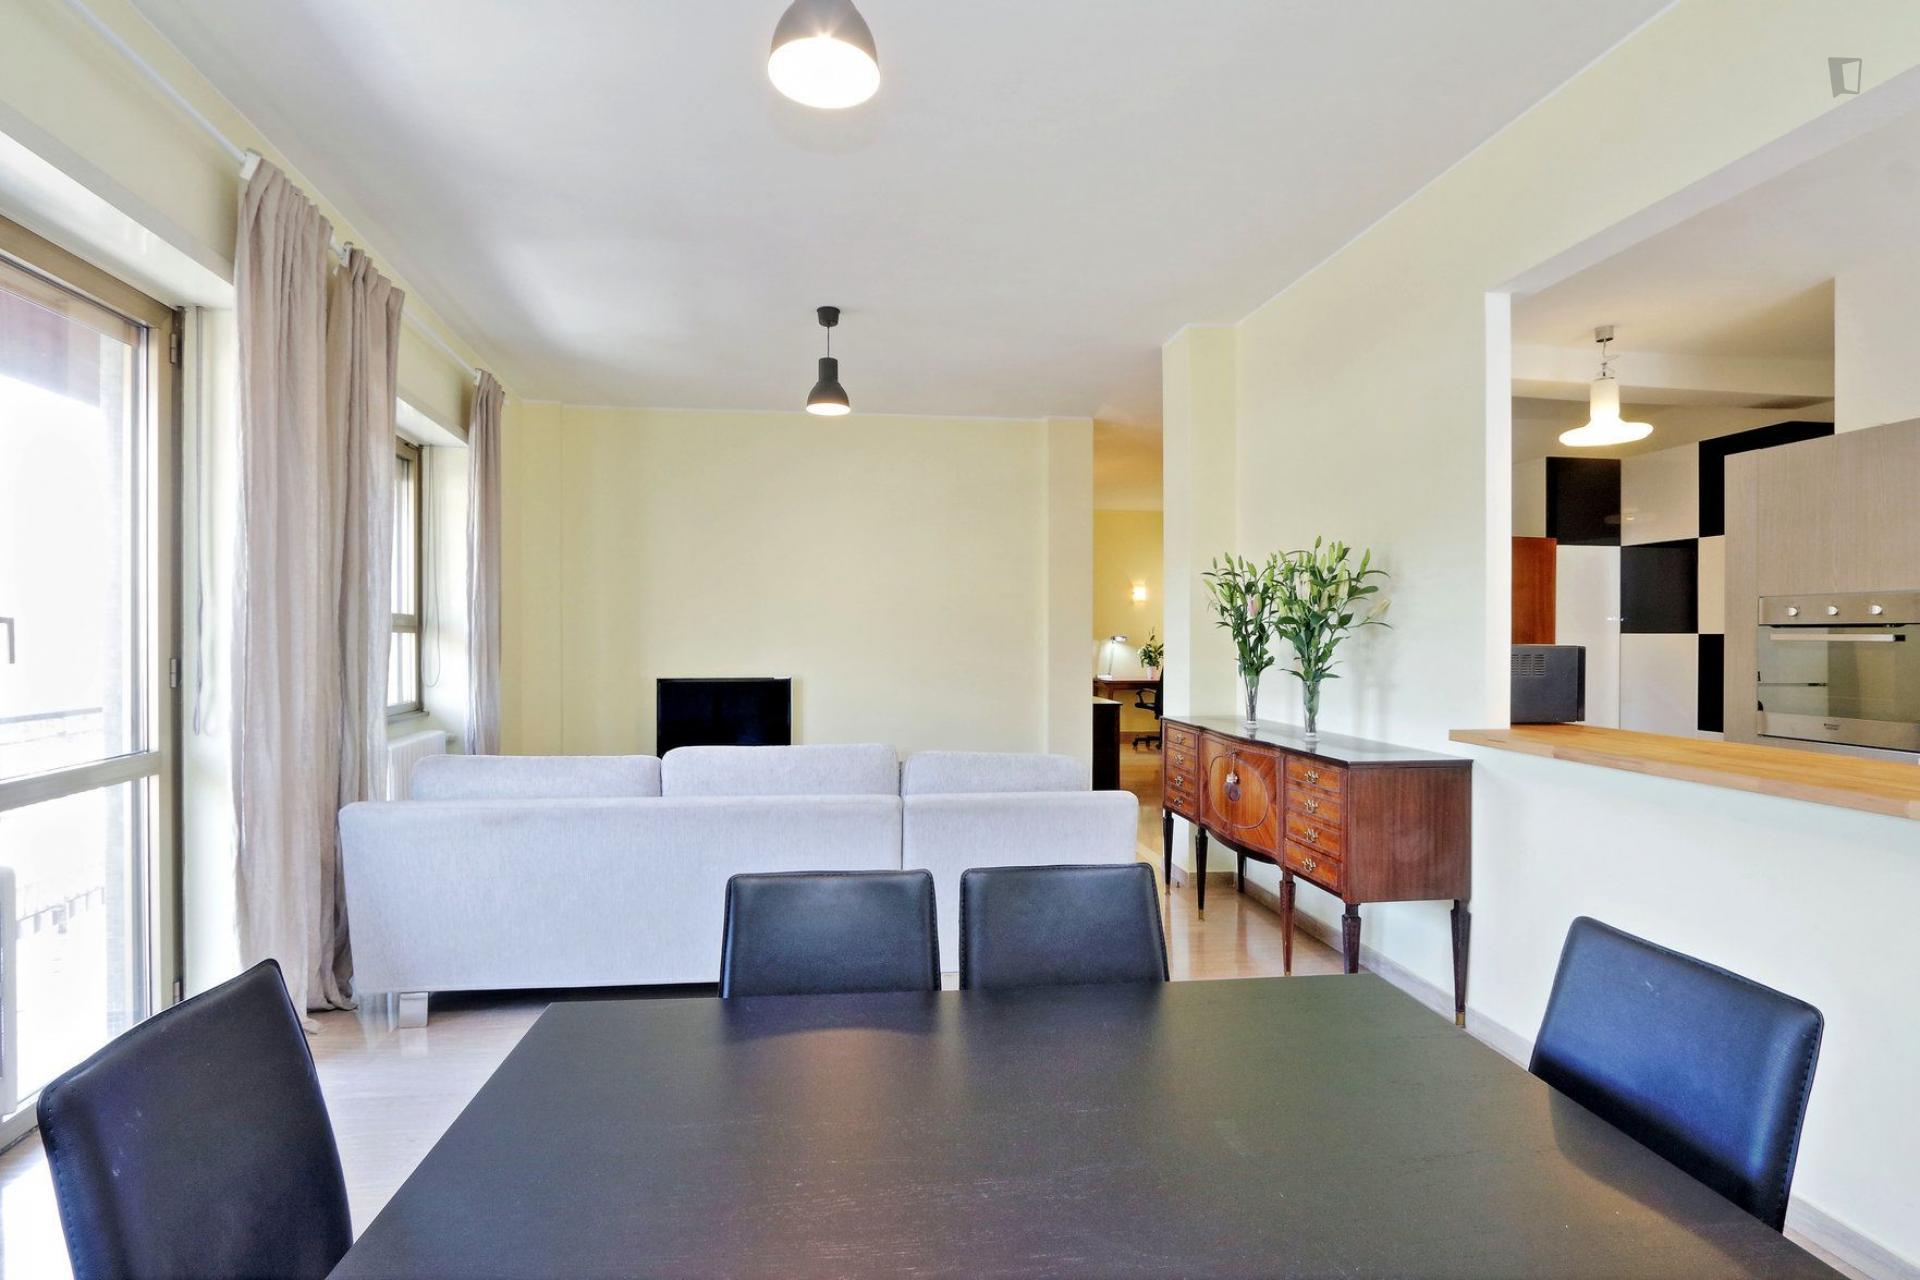 3 bed apartment at INPS Amba Aradam, Via dei Laterani, 00183 Rome ...